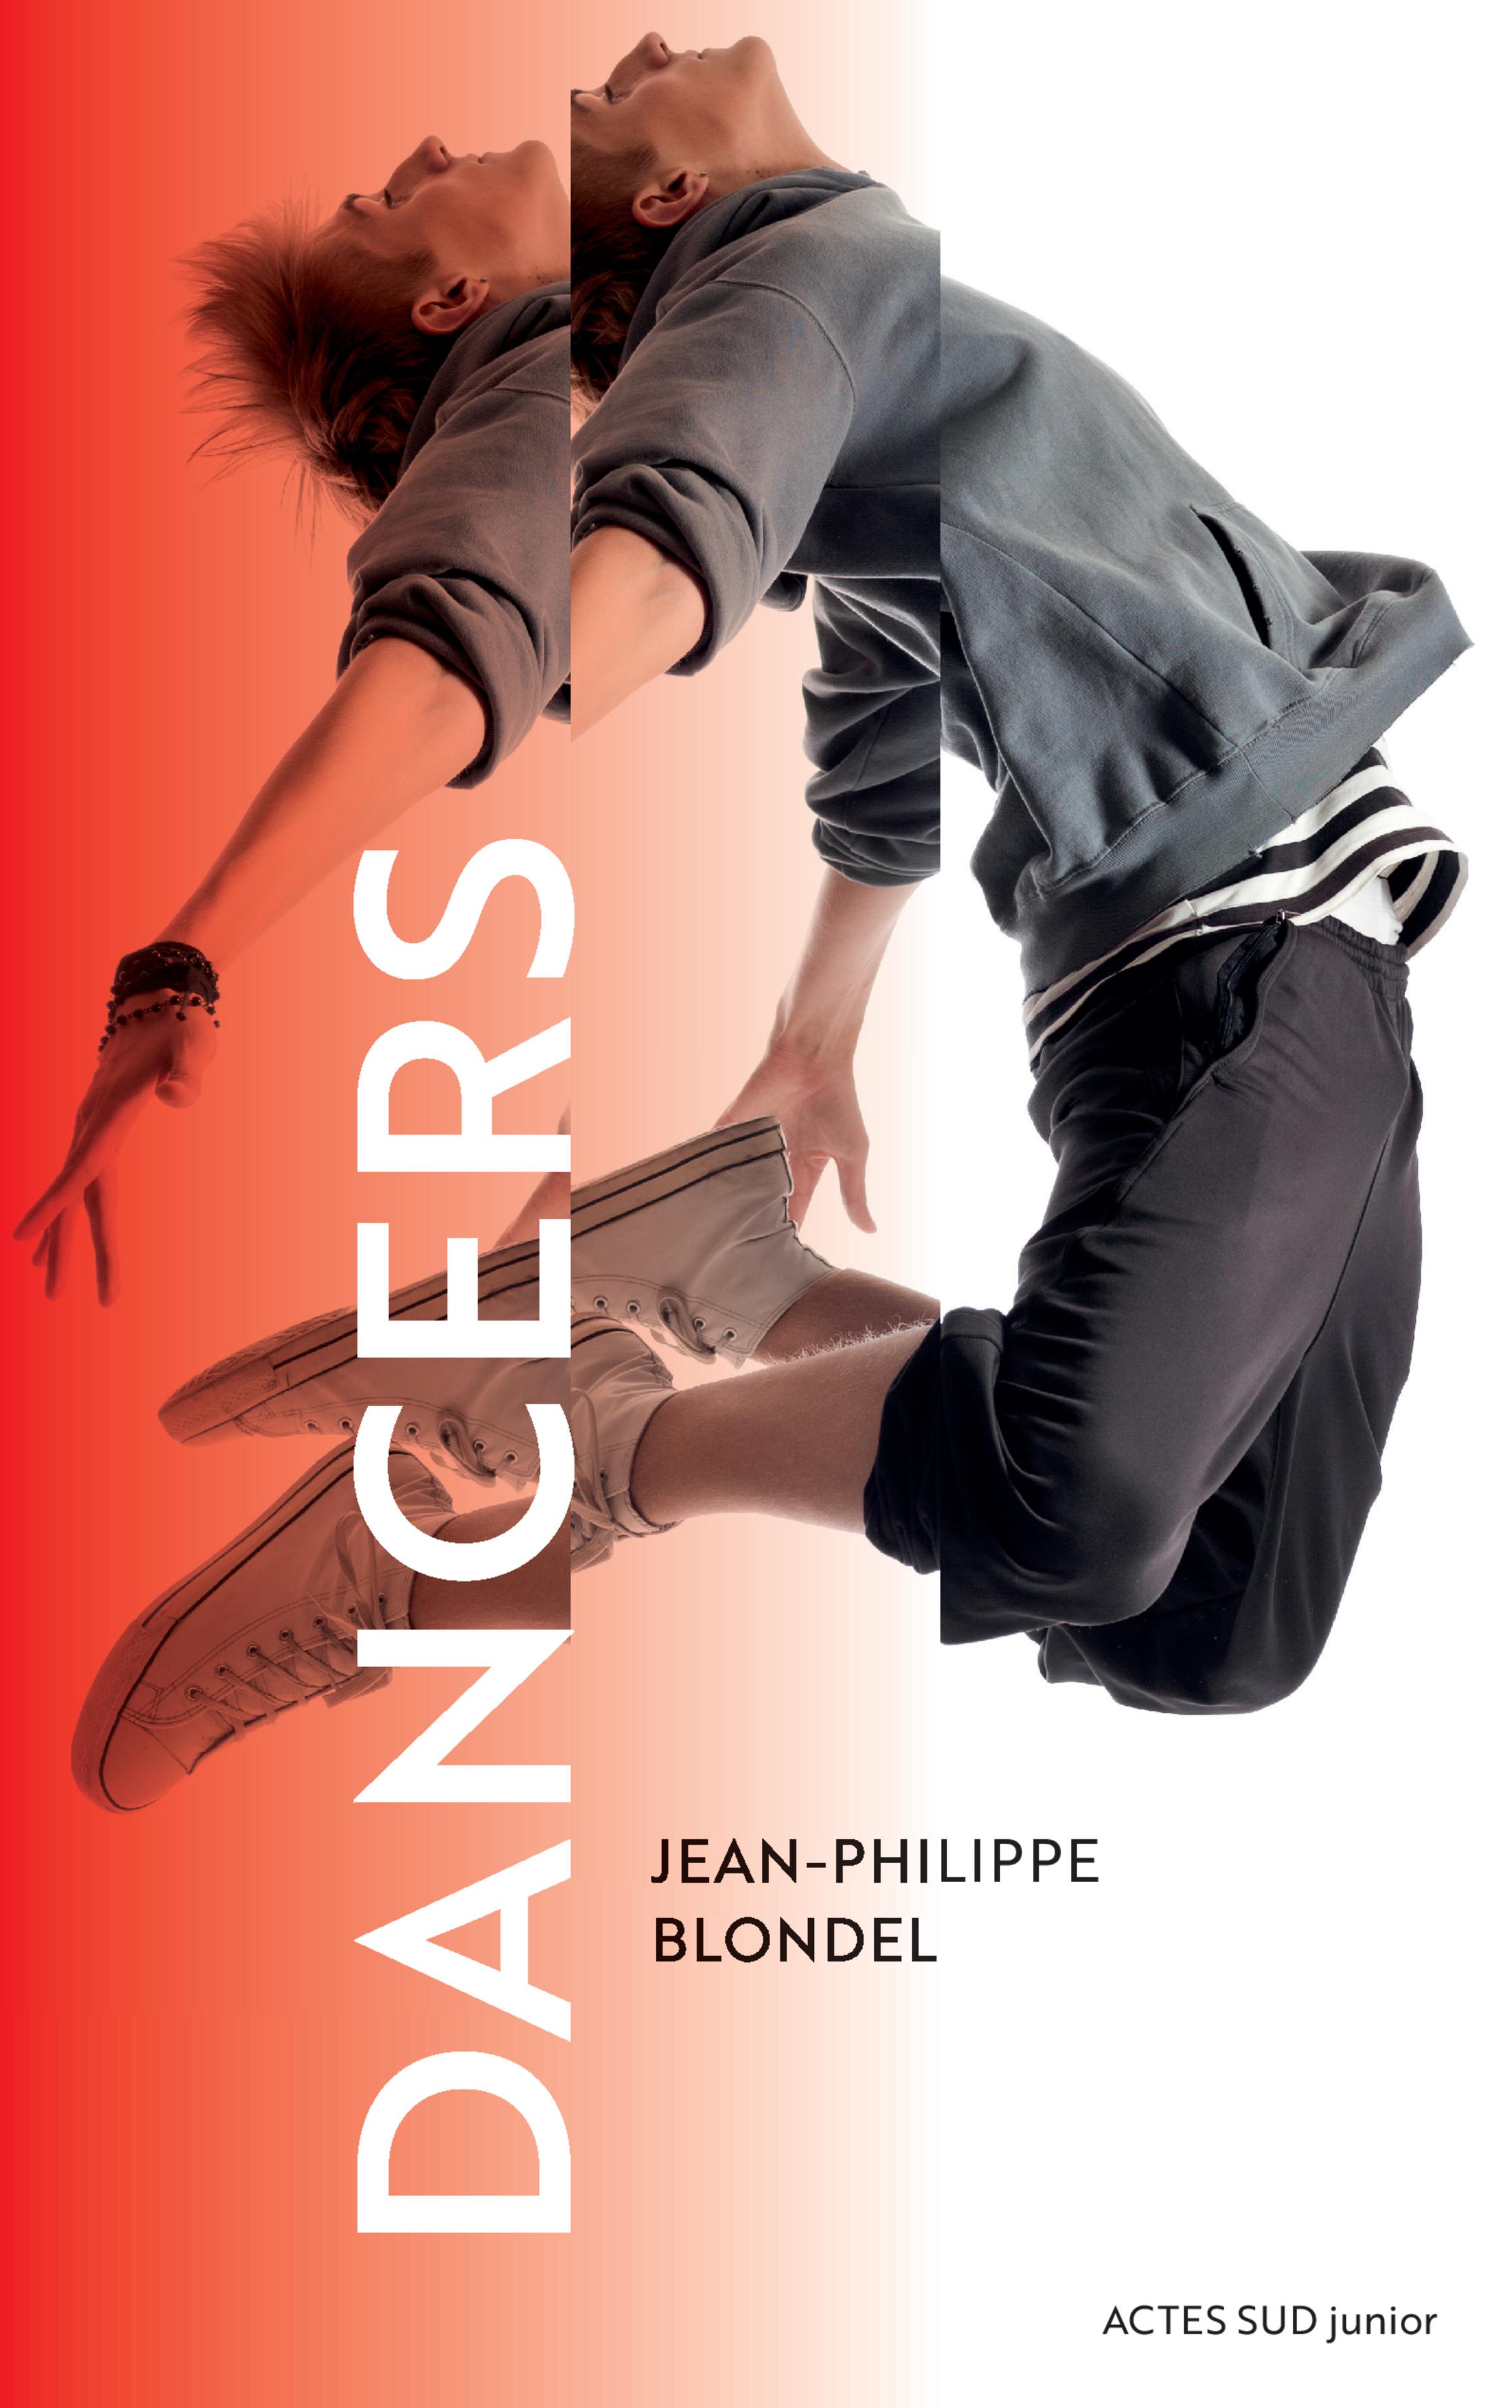 Dancers | Blondel, Jean-Philippe